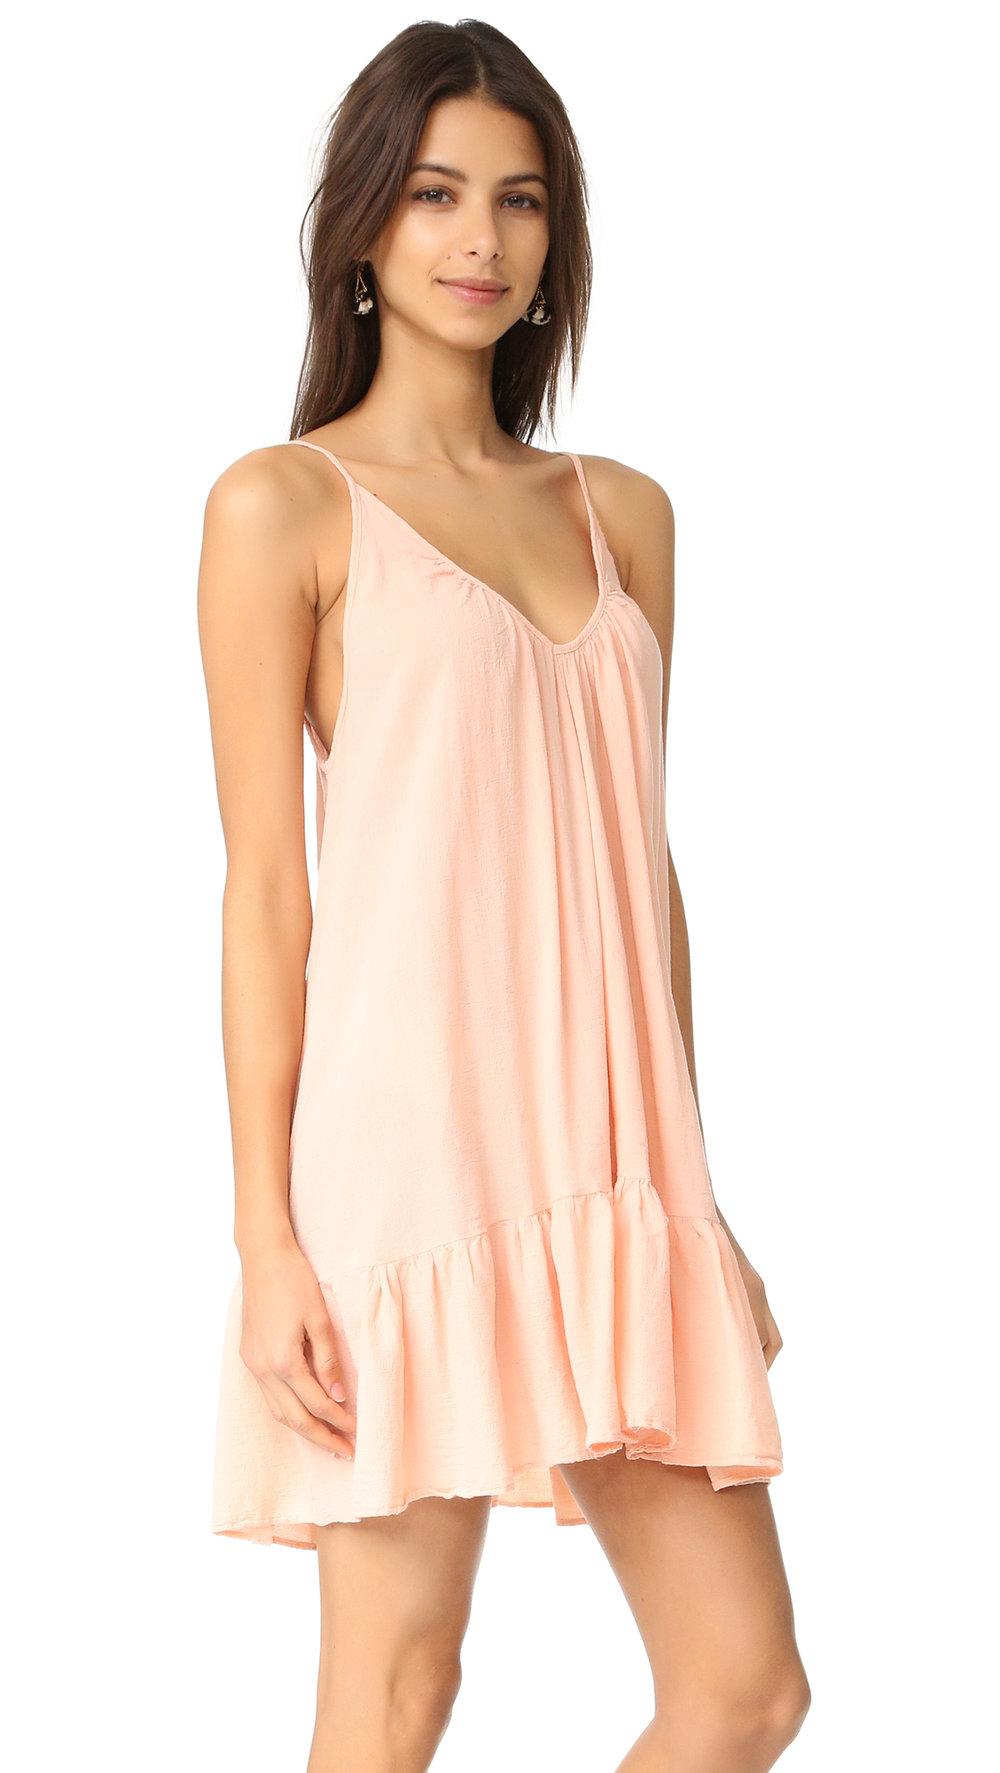 9seed-st-tropez-ruffle-mini-dress-1541311356-2.jpg